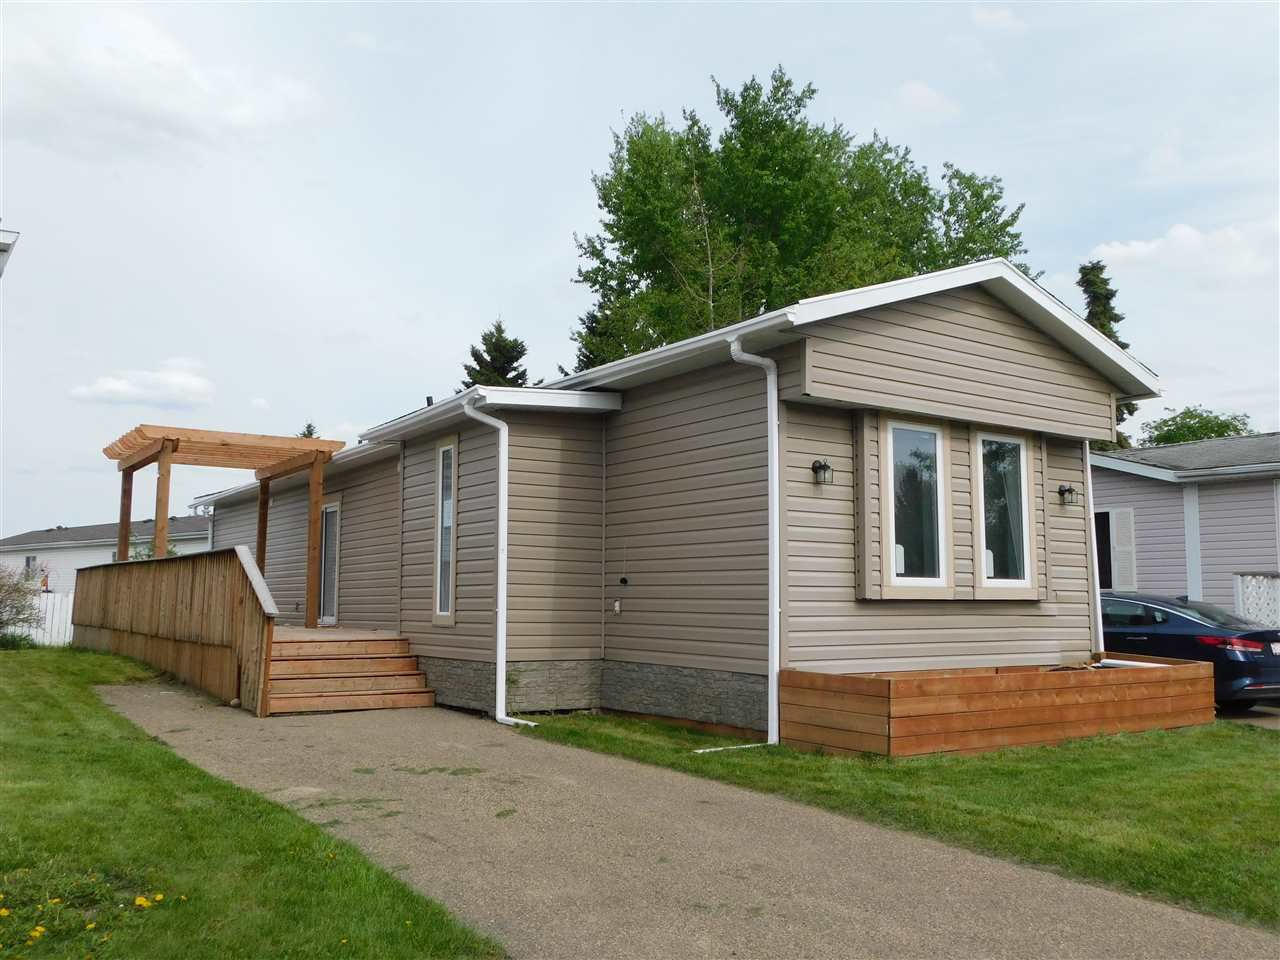 Main Photo: 1406 10770 Winterburn Road in Edmonton: Zone 59 Mobile for sale : MLS®# E4199979